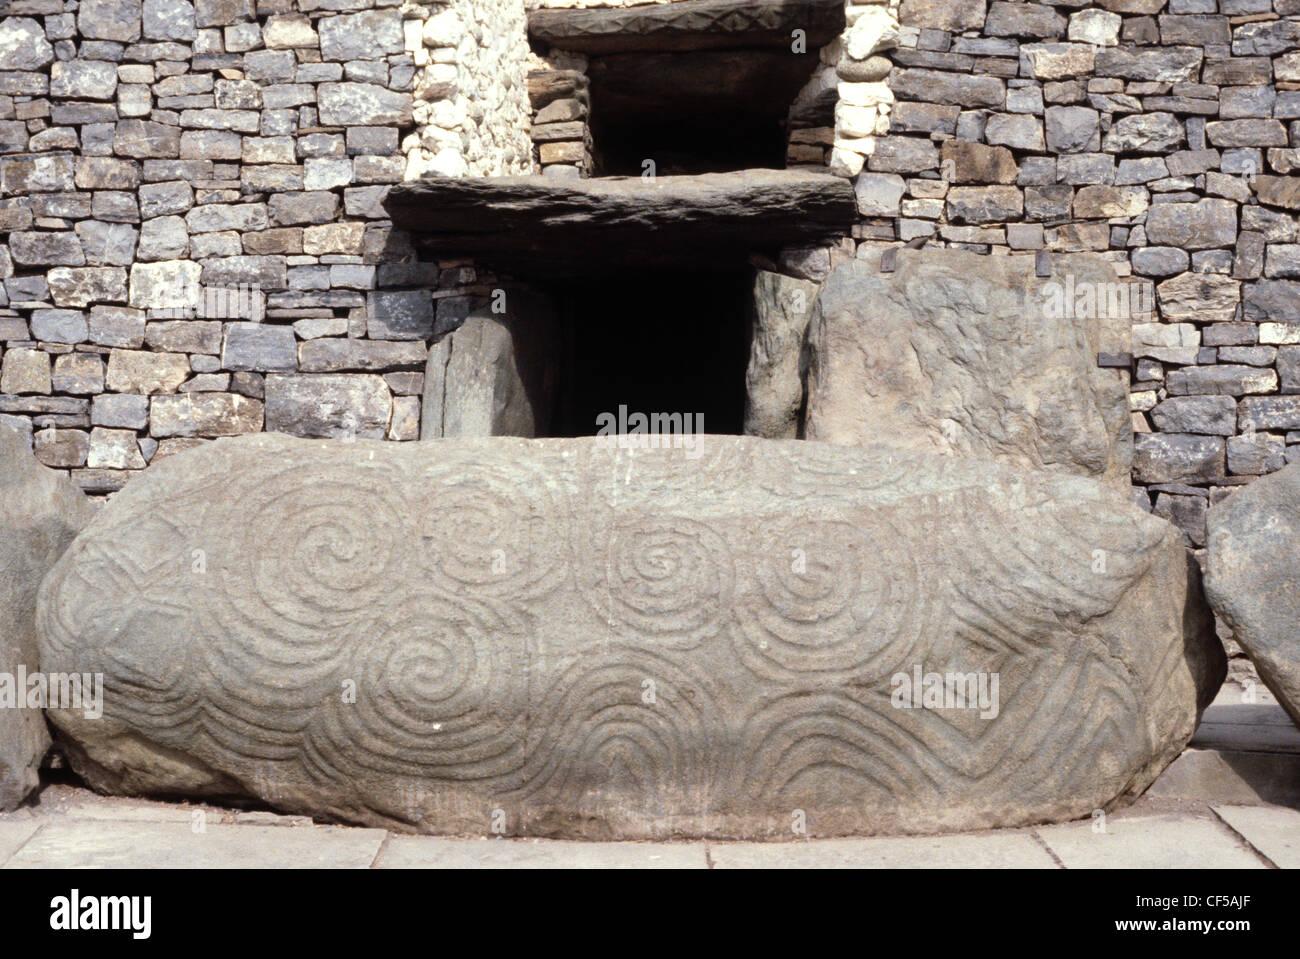 newgrange-passage-grave-entrance-CF5AJF.